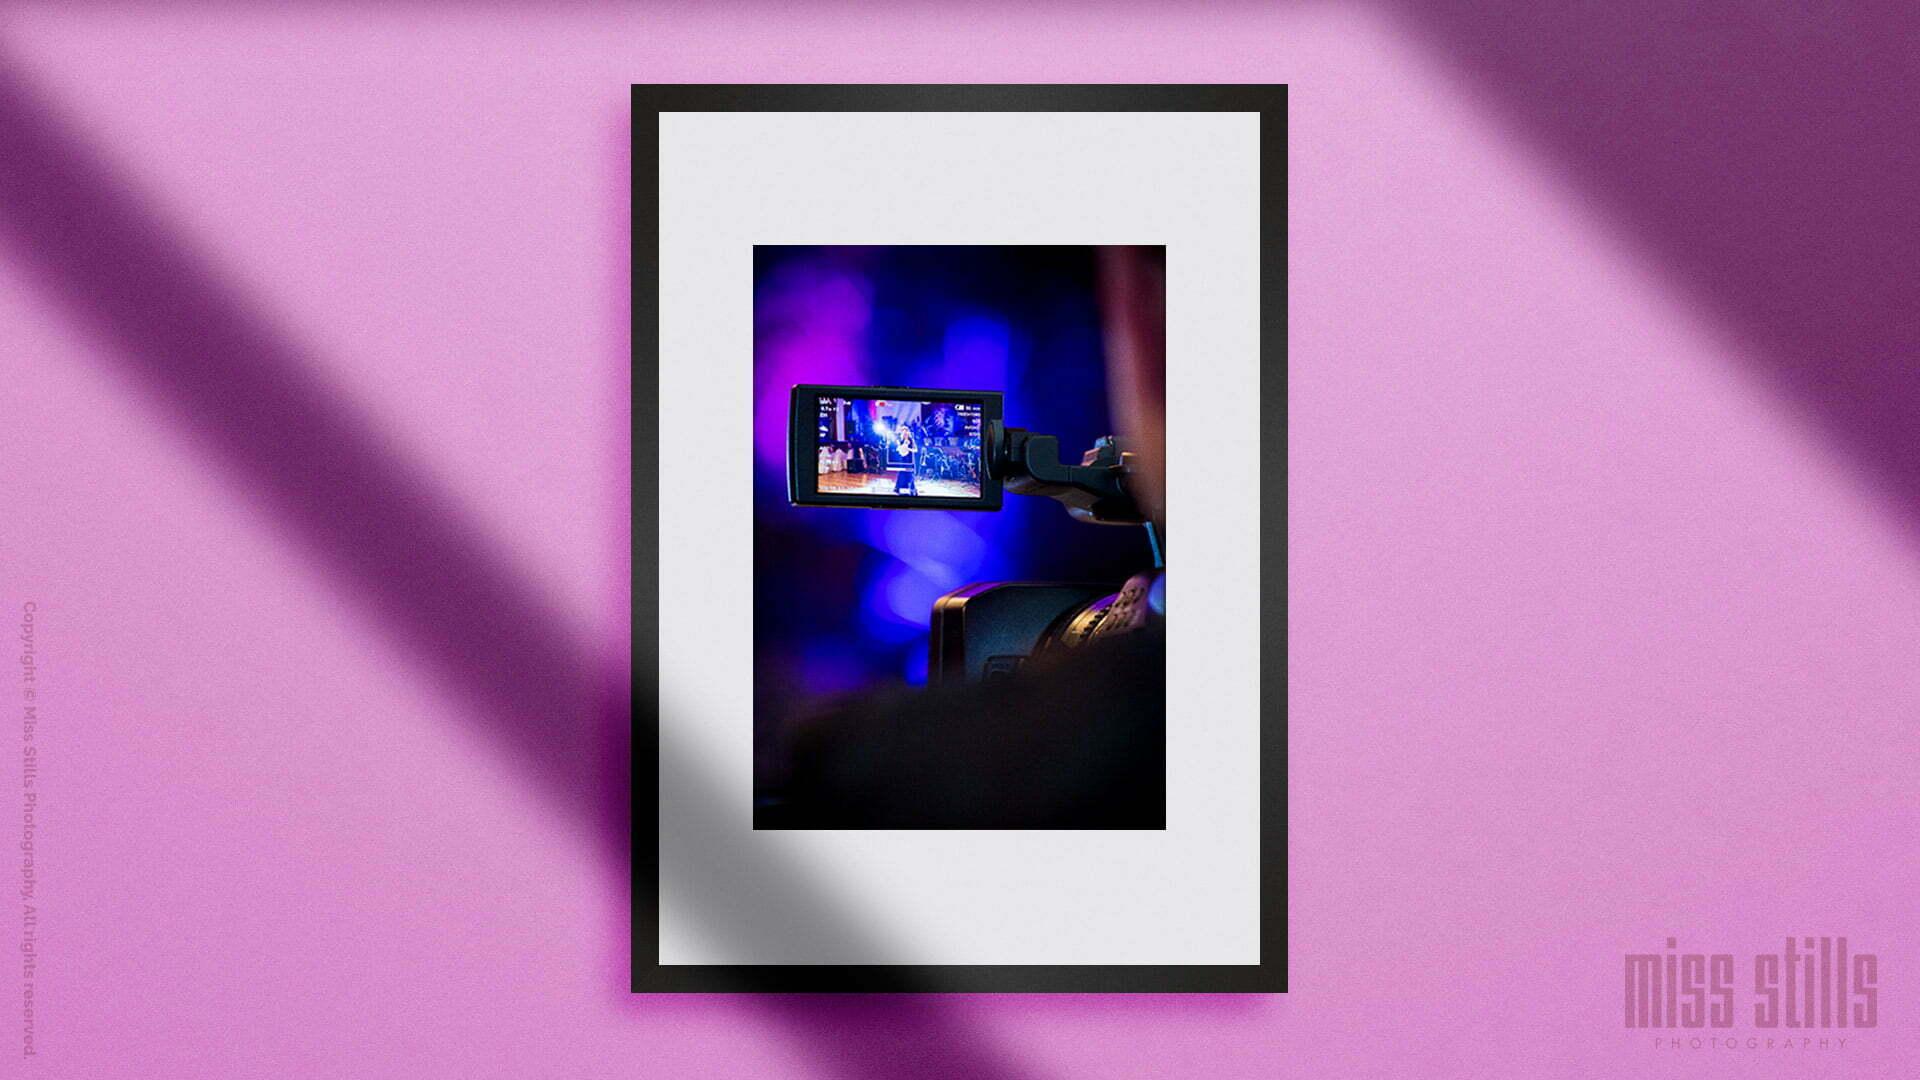 Miss Stills Photography // Tijana Jankovic-Jevric